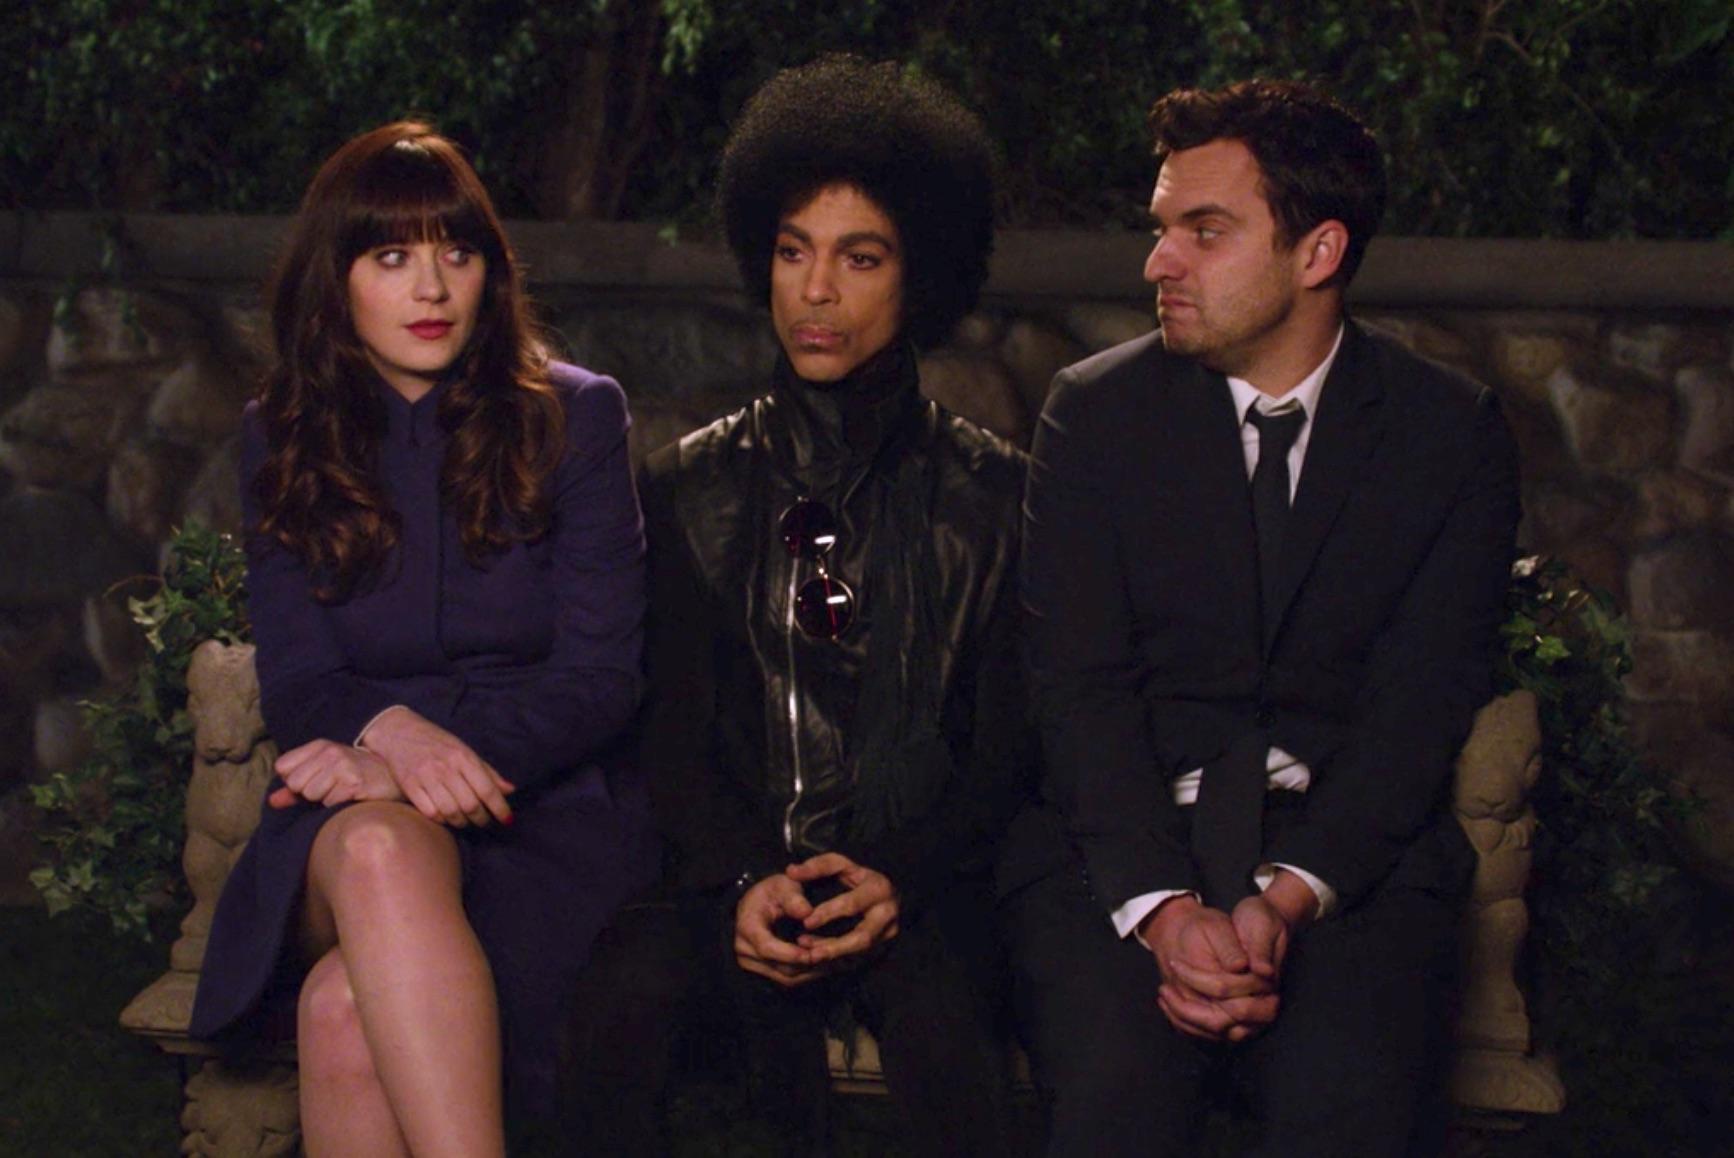 Prince was on New Girl